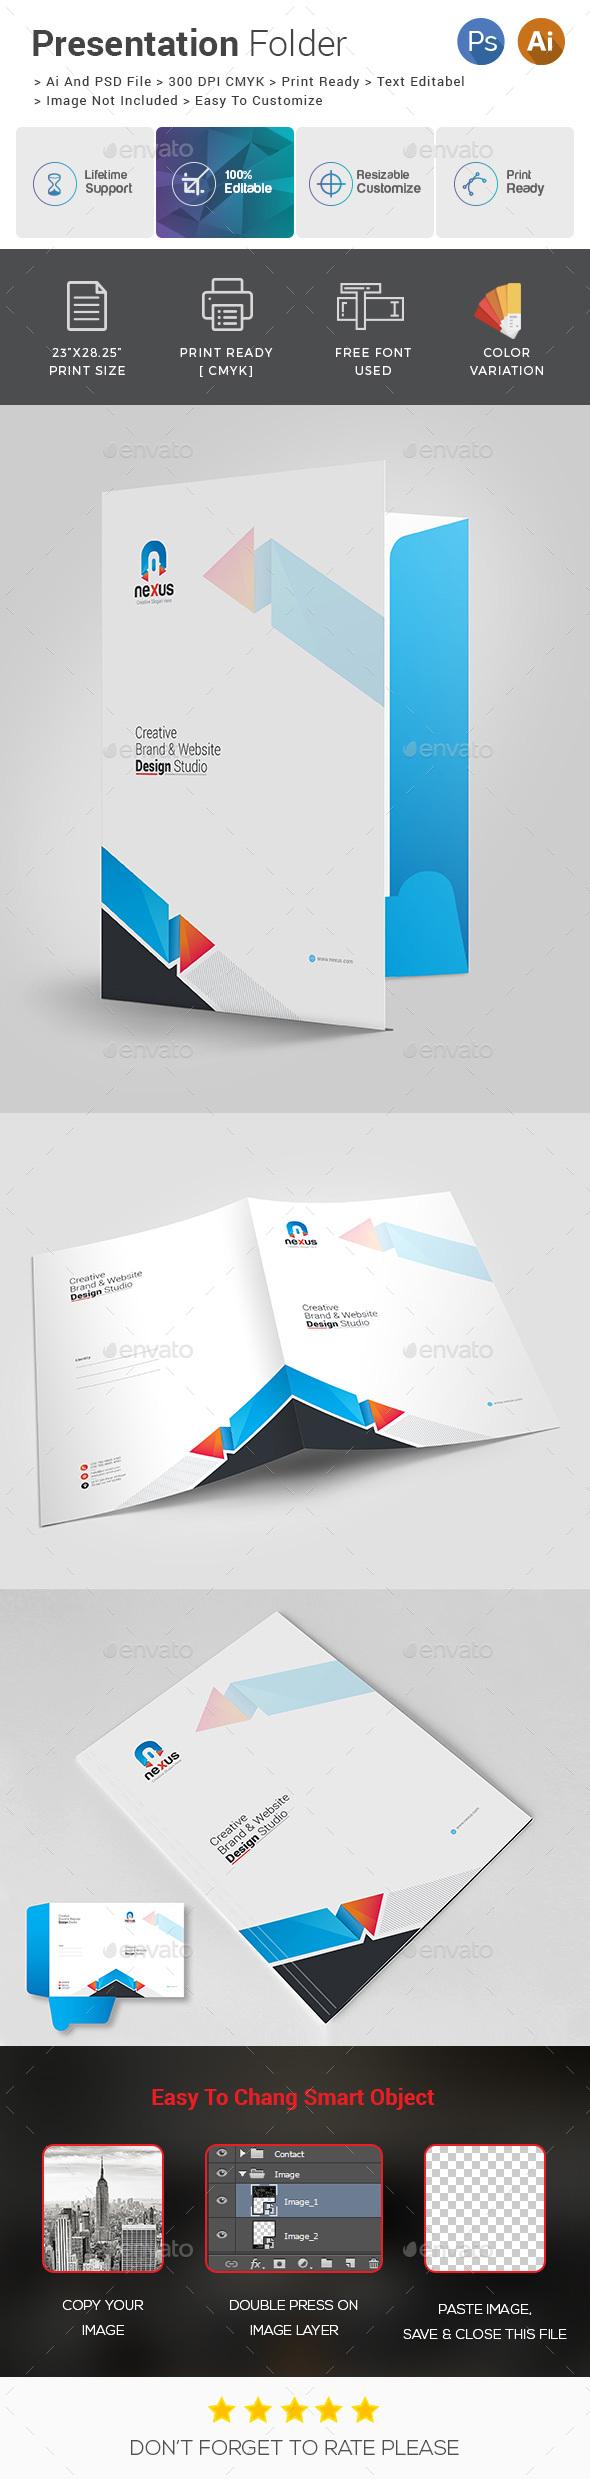 Nexus Presentation Folder - Stationery Print Templates